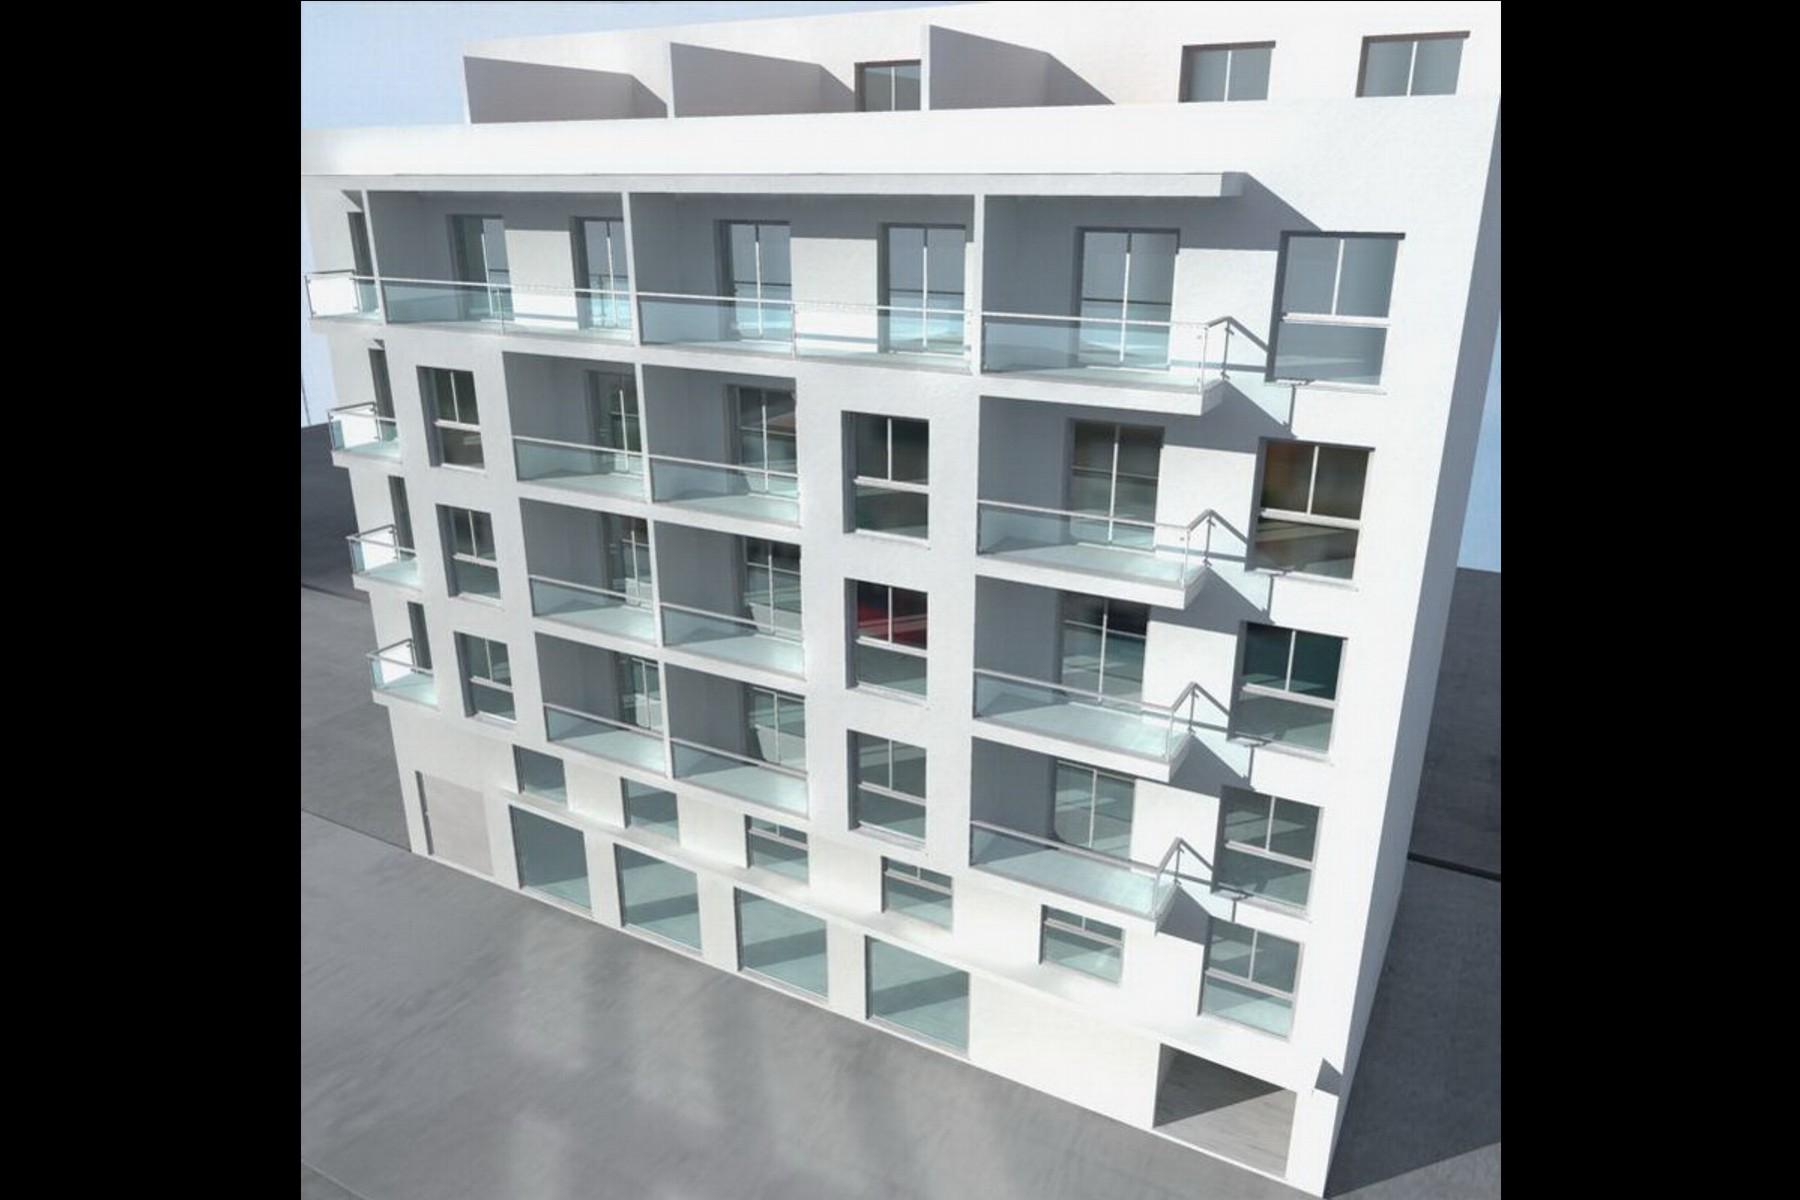 Imaginarq-042-edificio-viviendas.-Pego.-Alicante.11A